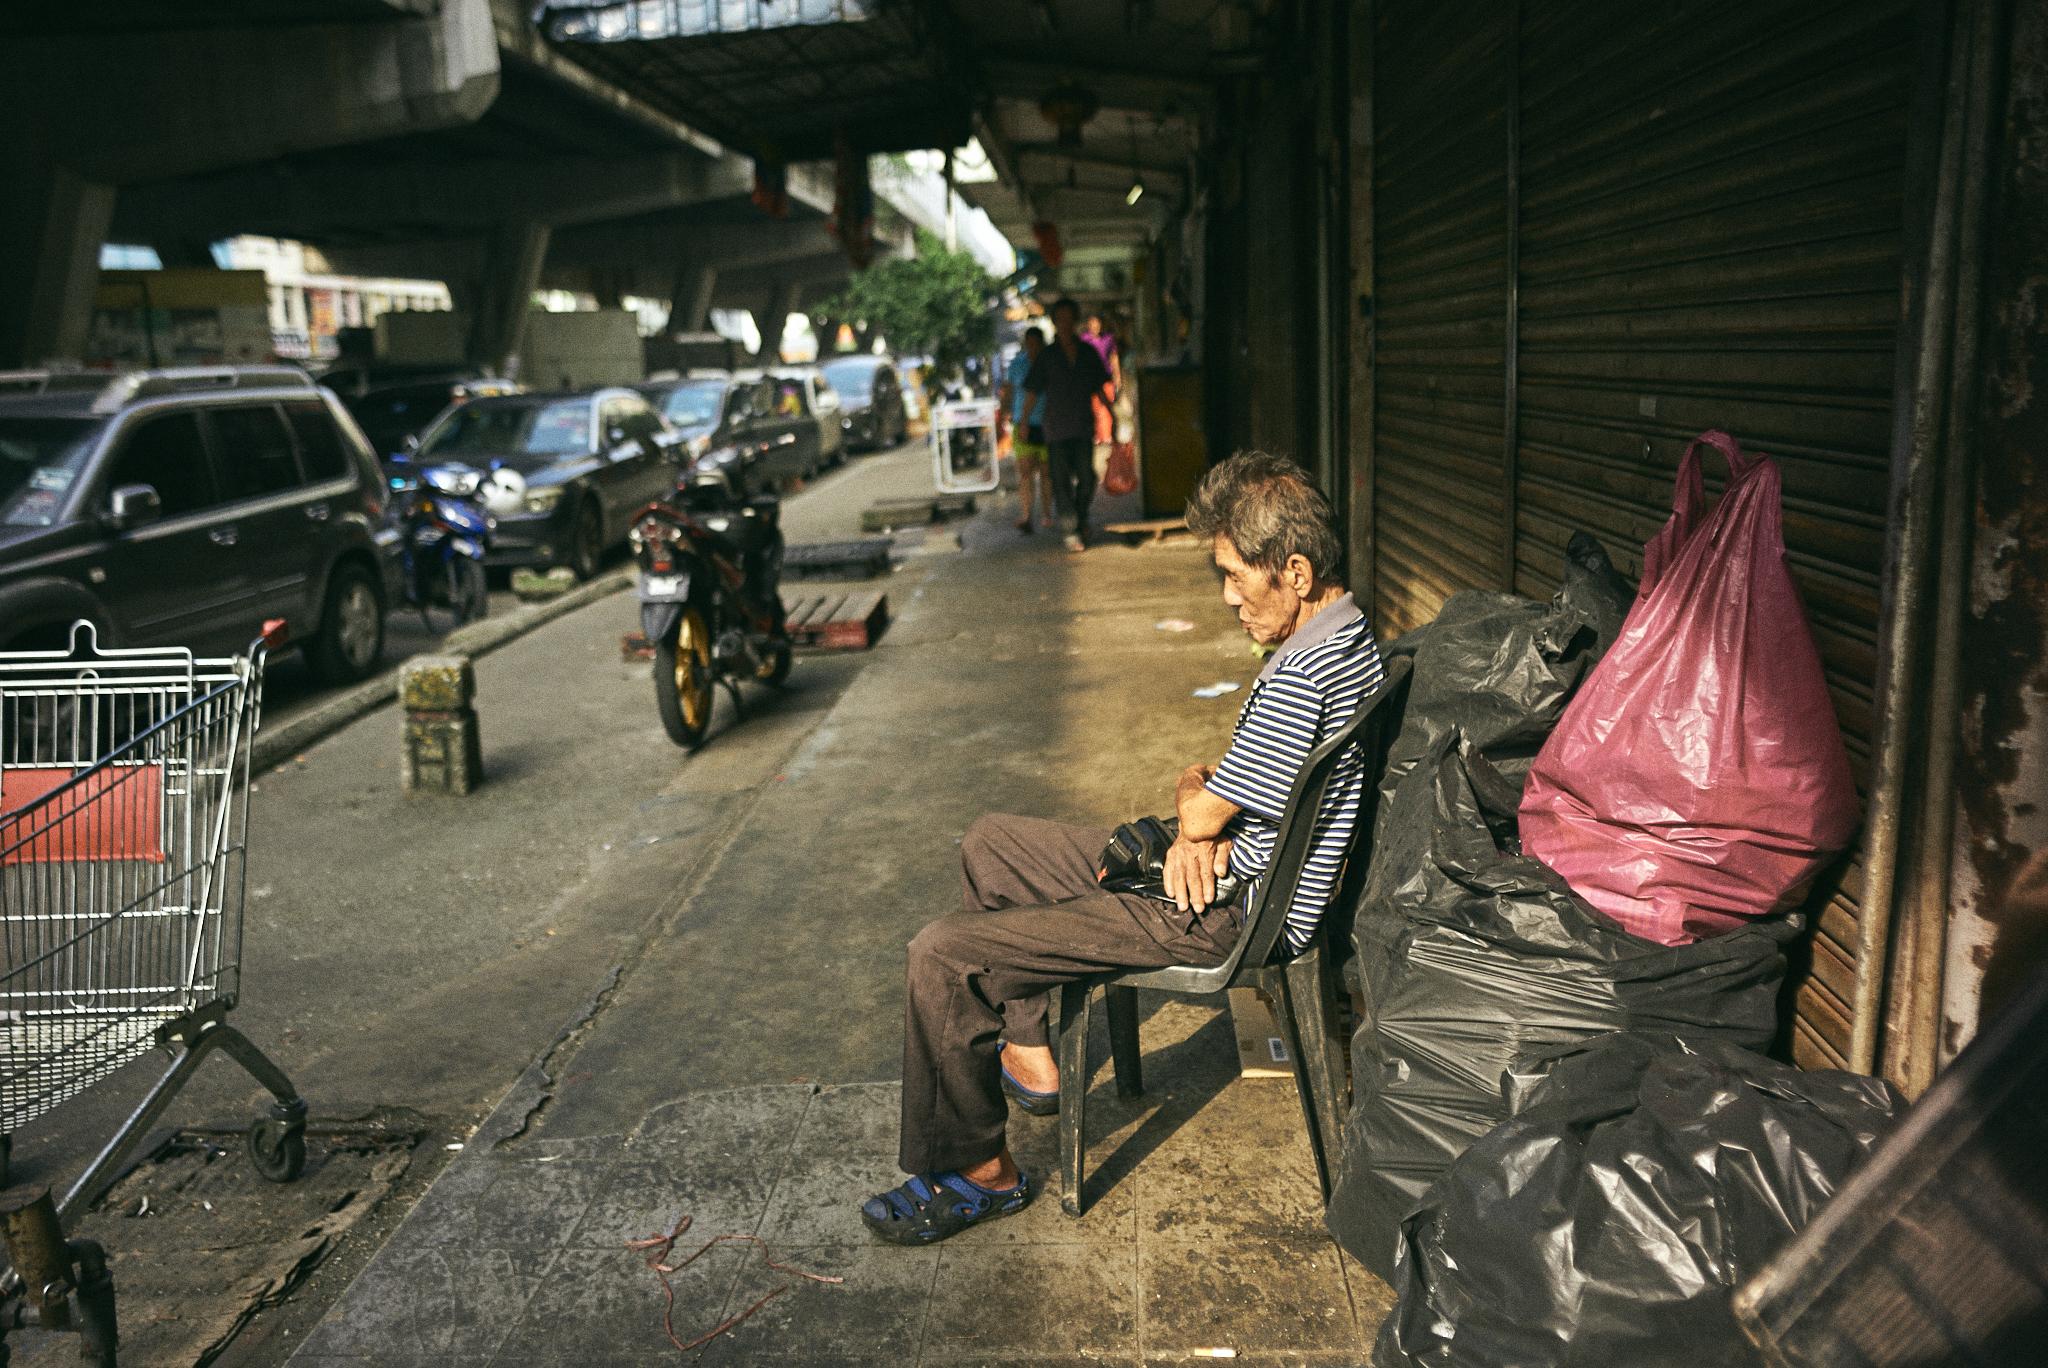 kuala lumpur street photography, durian